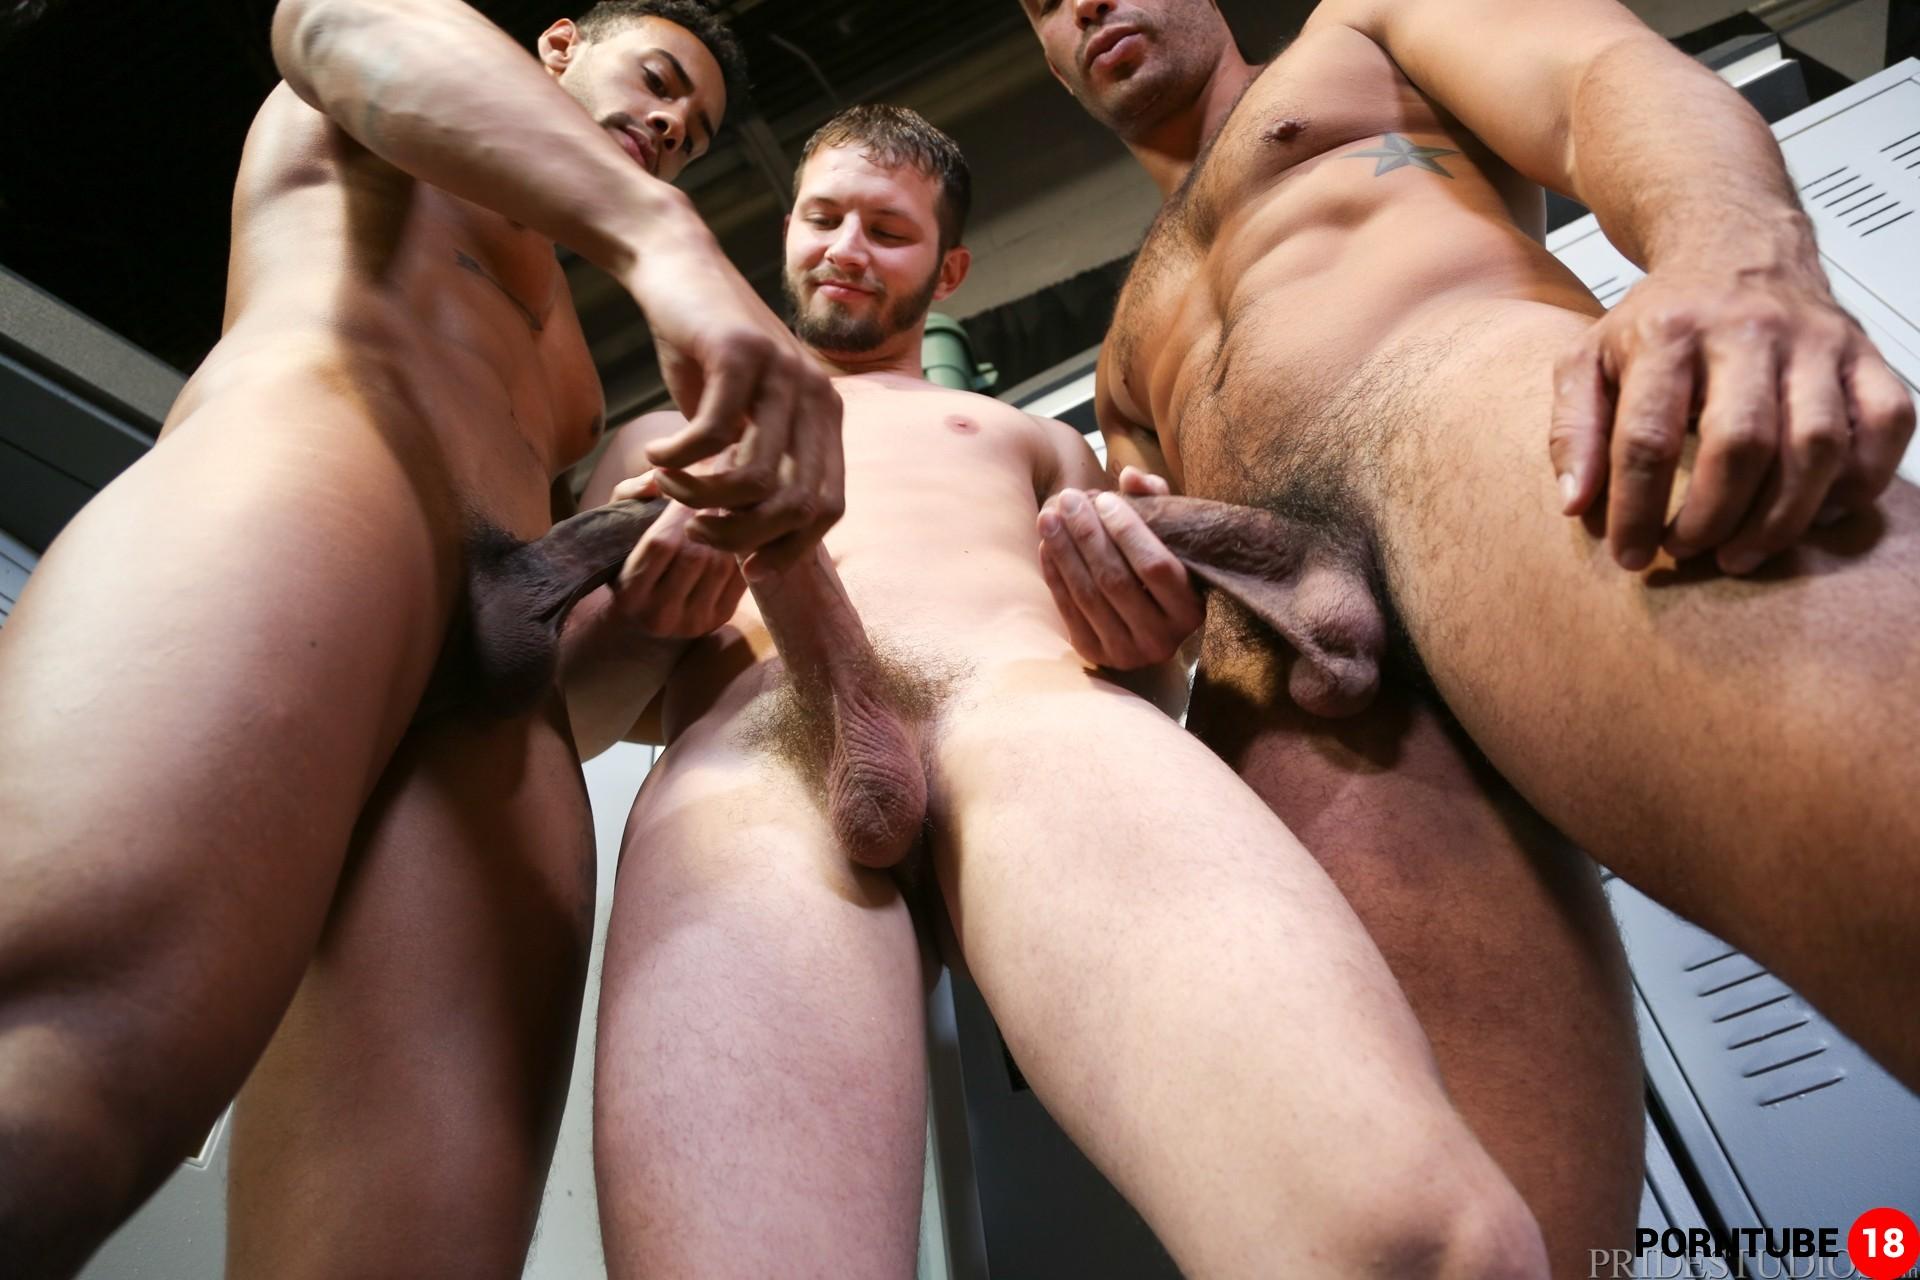 Adam Hardy Porn bigdicksatschool – cutting weight adam hardy & robert